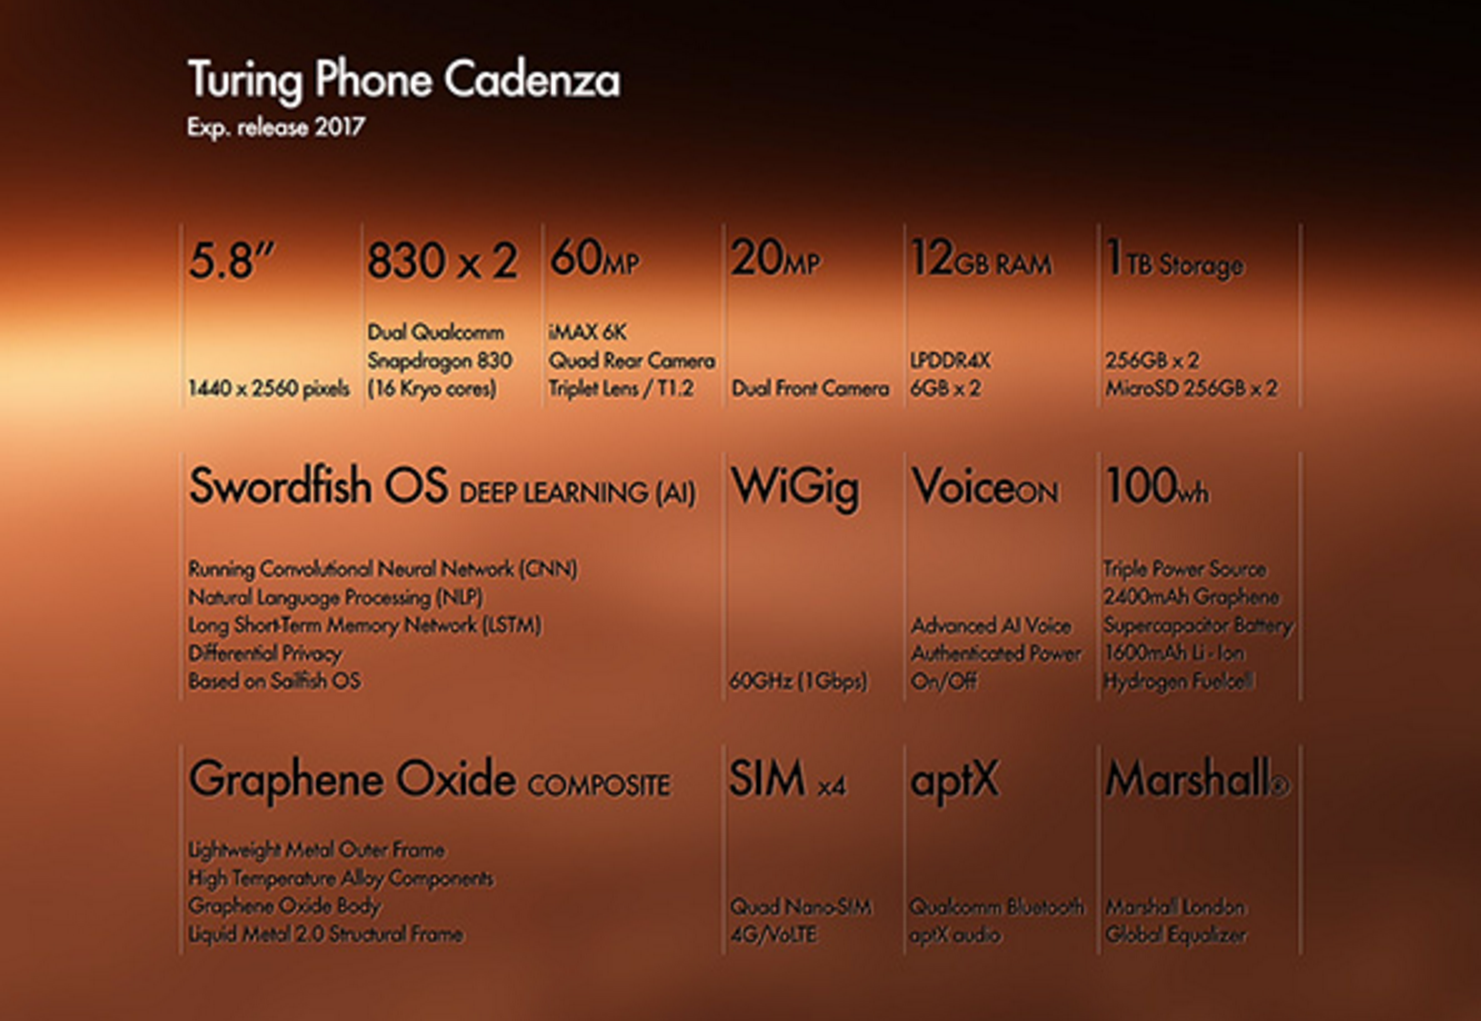 Turing Phone Cadenza 2